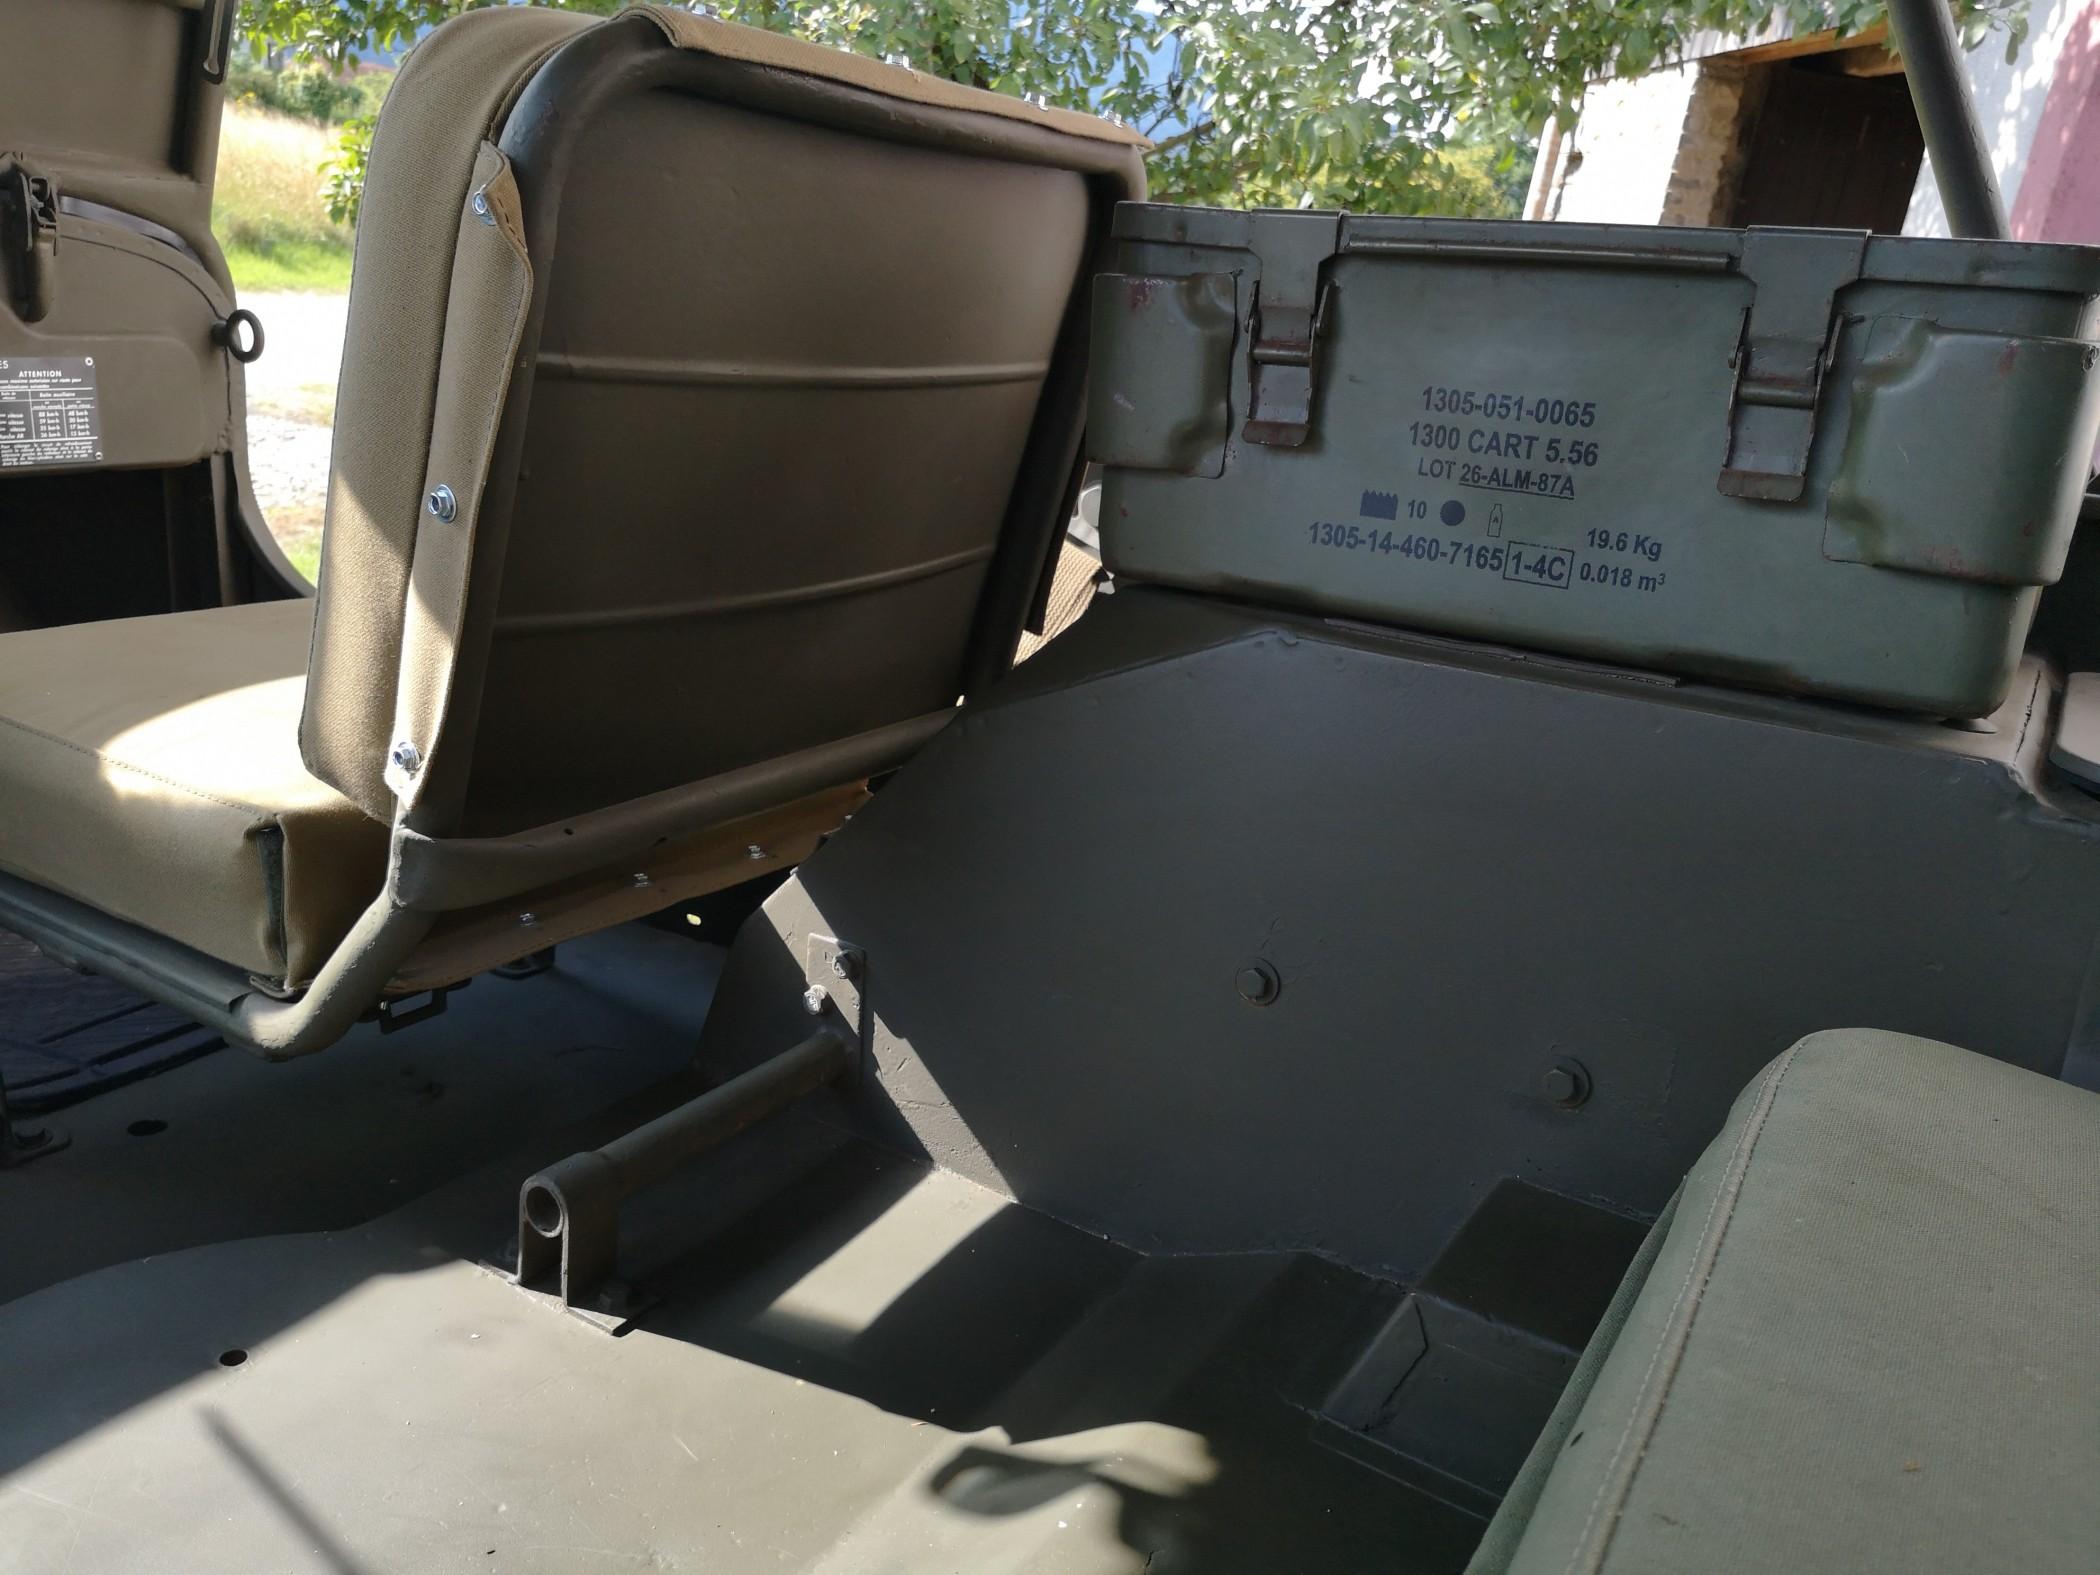 hotchkiss m201 jeep 1962 vendre. Black Bedroom Furniture Sets. Home Design Ideas